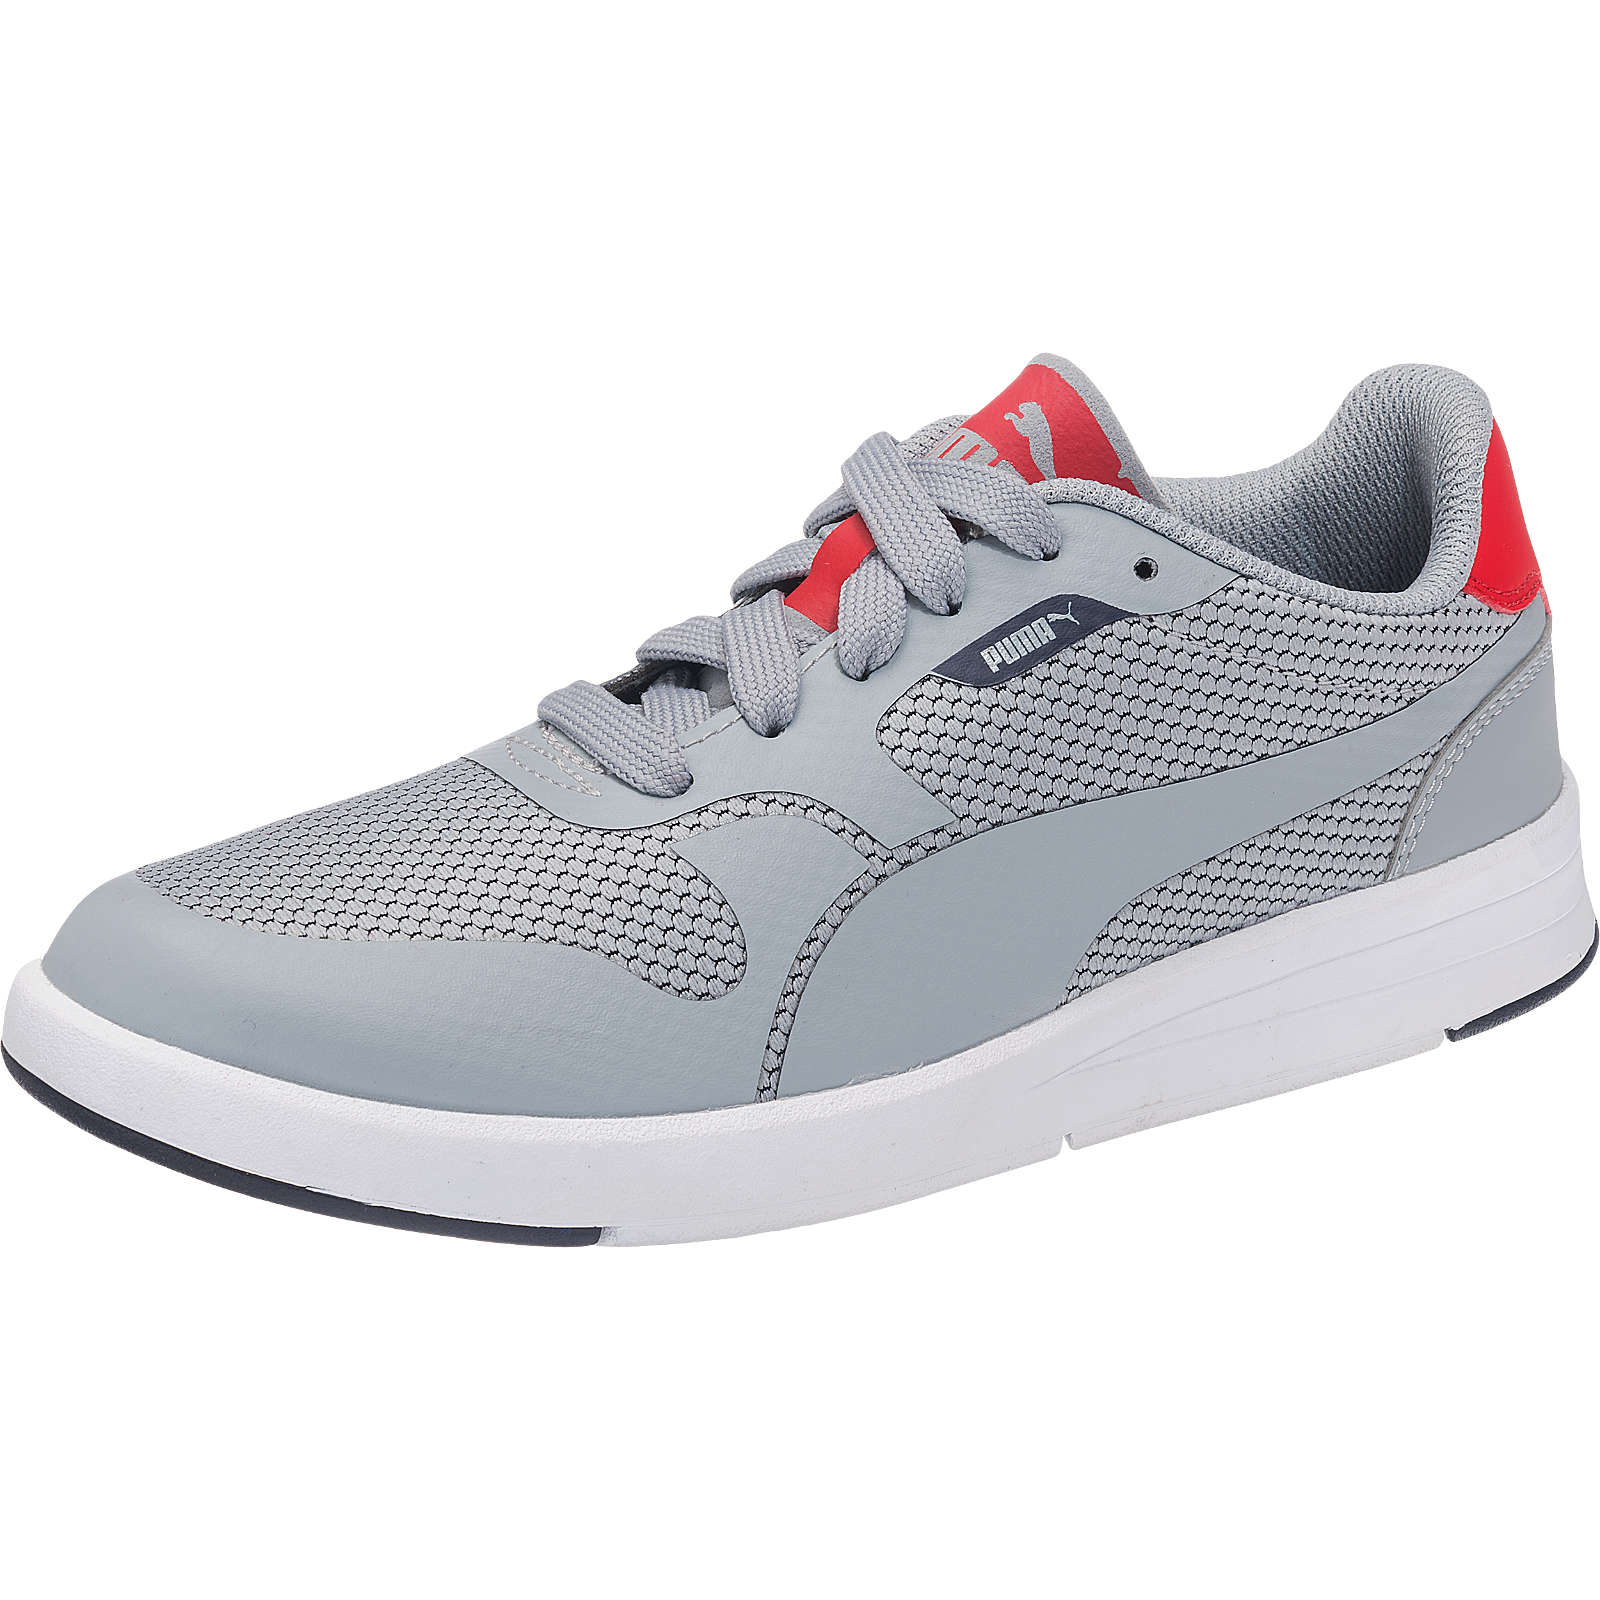 PUMA Kinder Sneakers Icra Evo grau Gr. 36